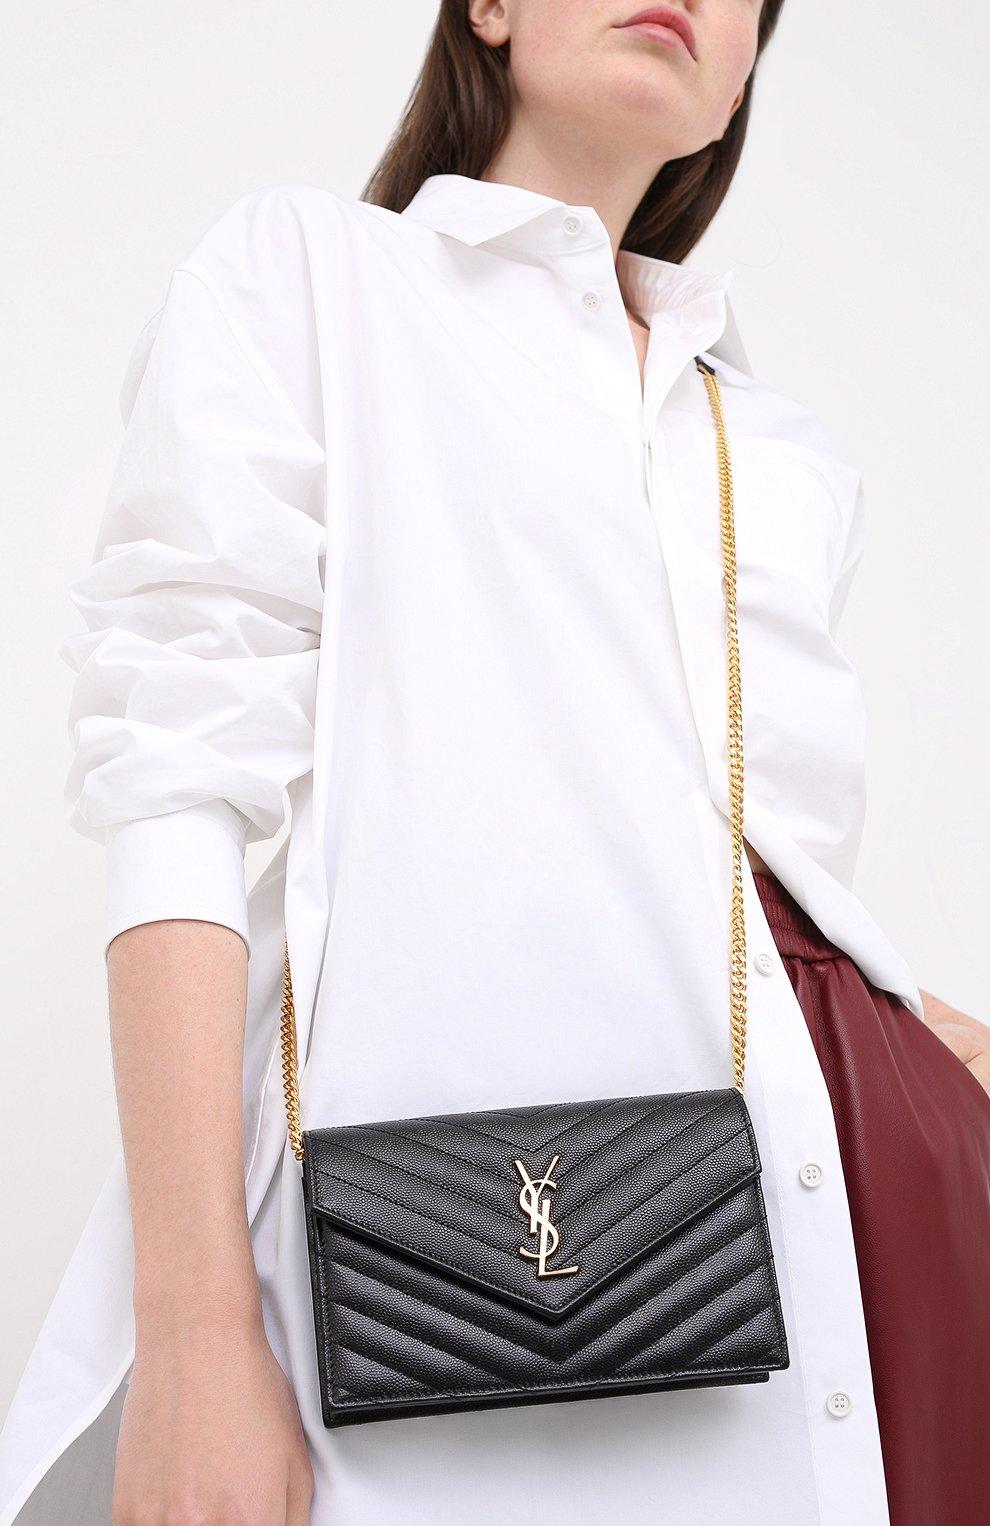 Женская сумка monogram envelope mini  SAINT LAURENT черного цвета, арт. 393953/B0W01 | Фото 2